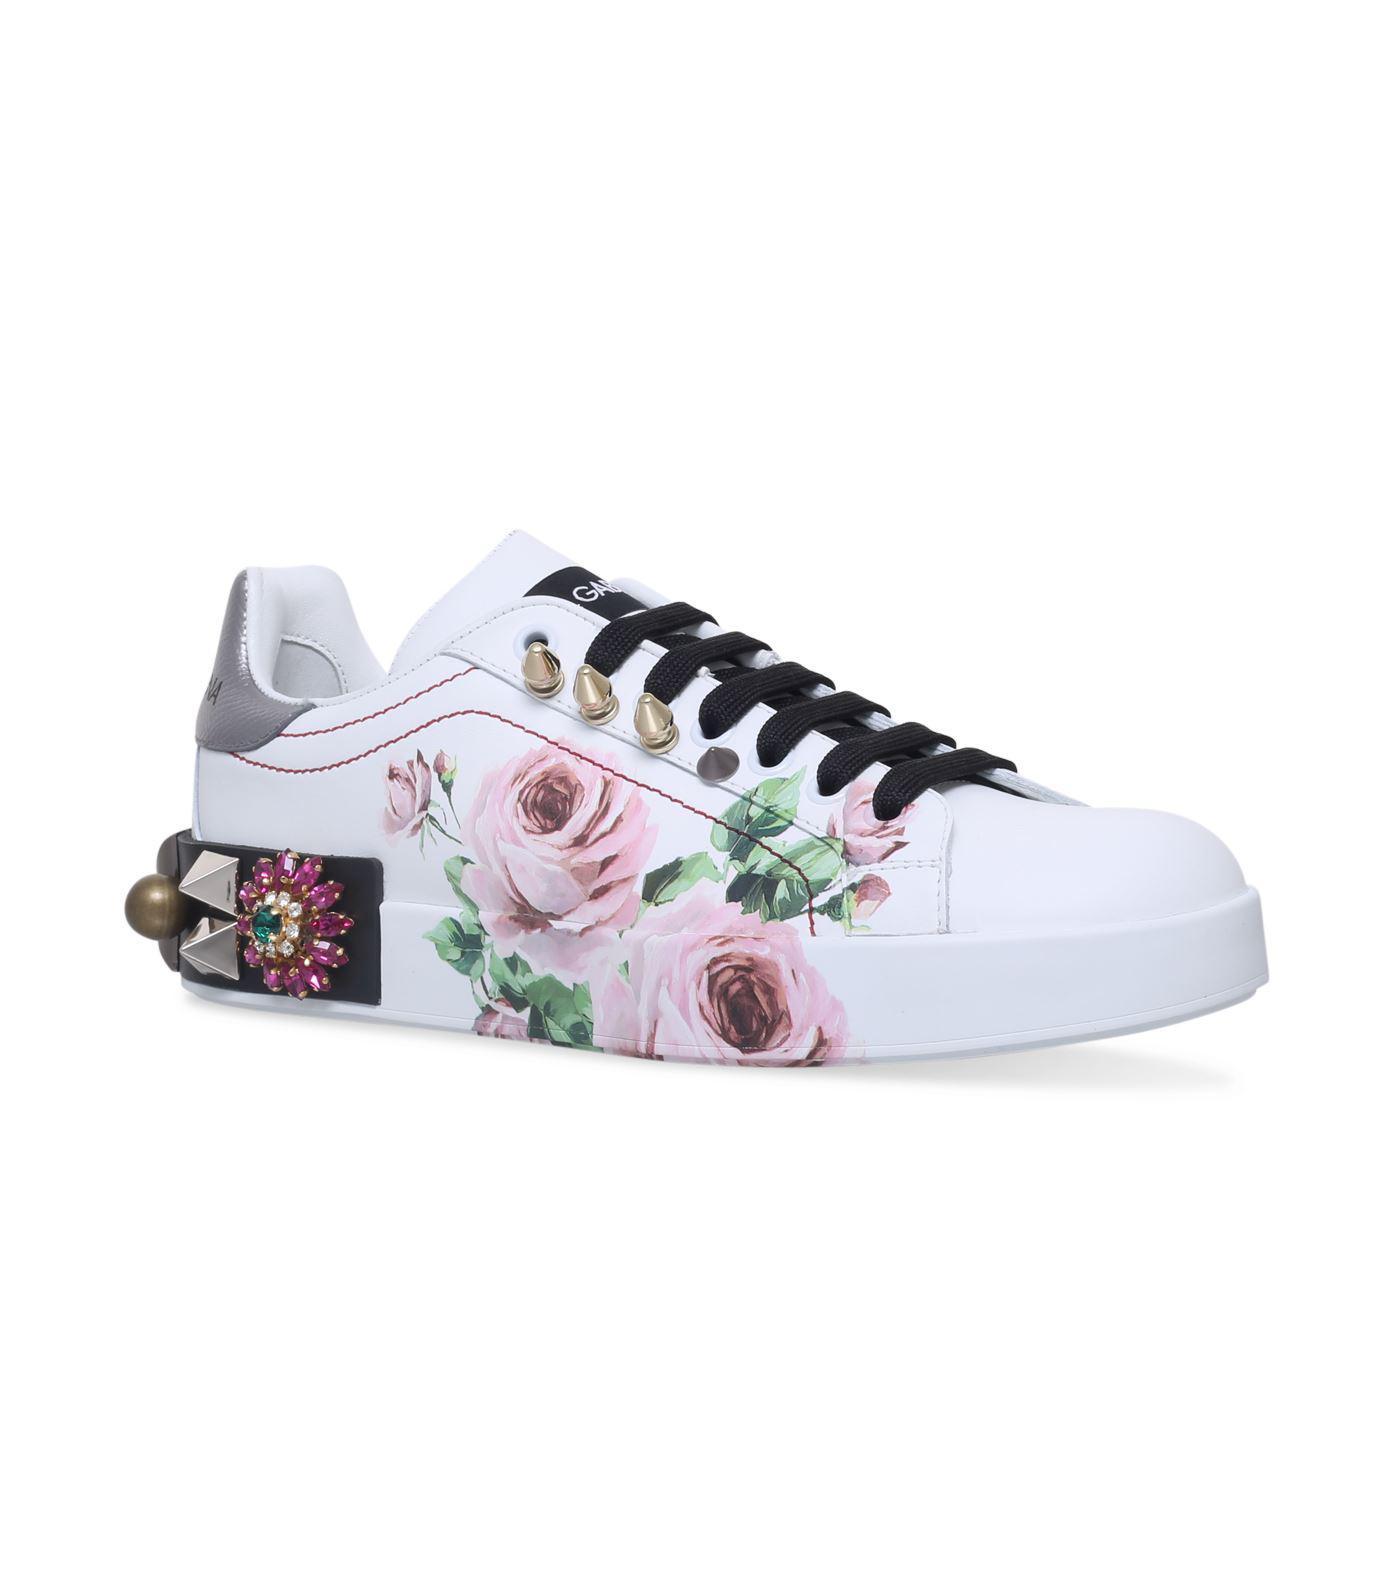 Embellished Rose Print Sneakers in Pink